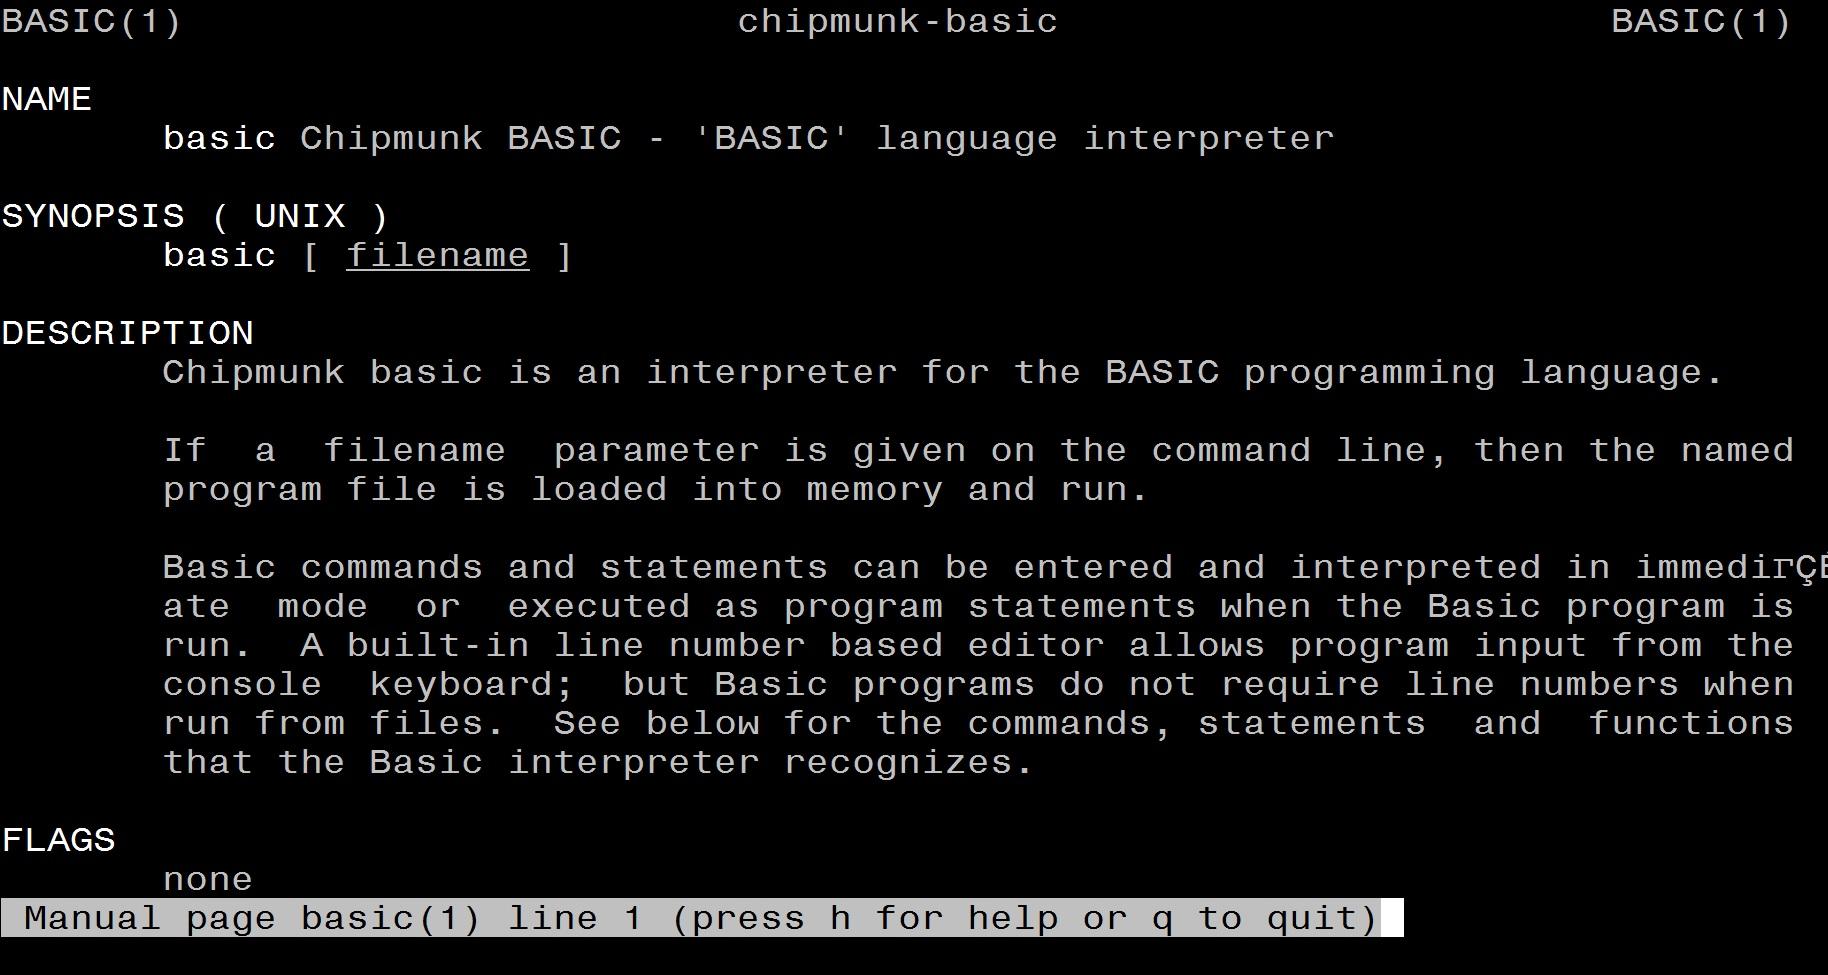 Installing Chipmunk BASIC on CentOS 7 - Brent's World